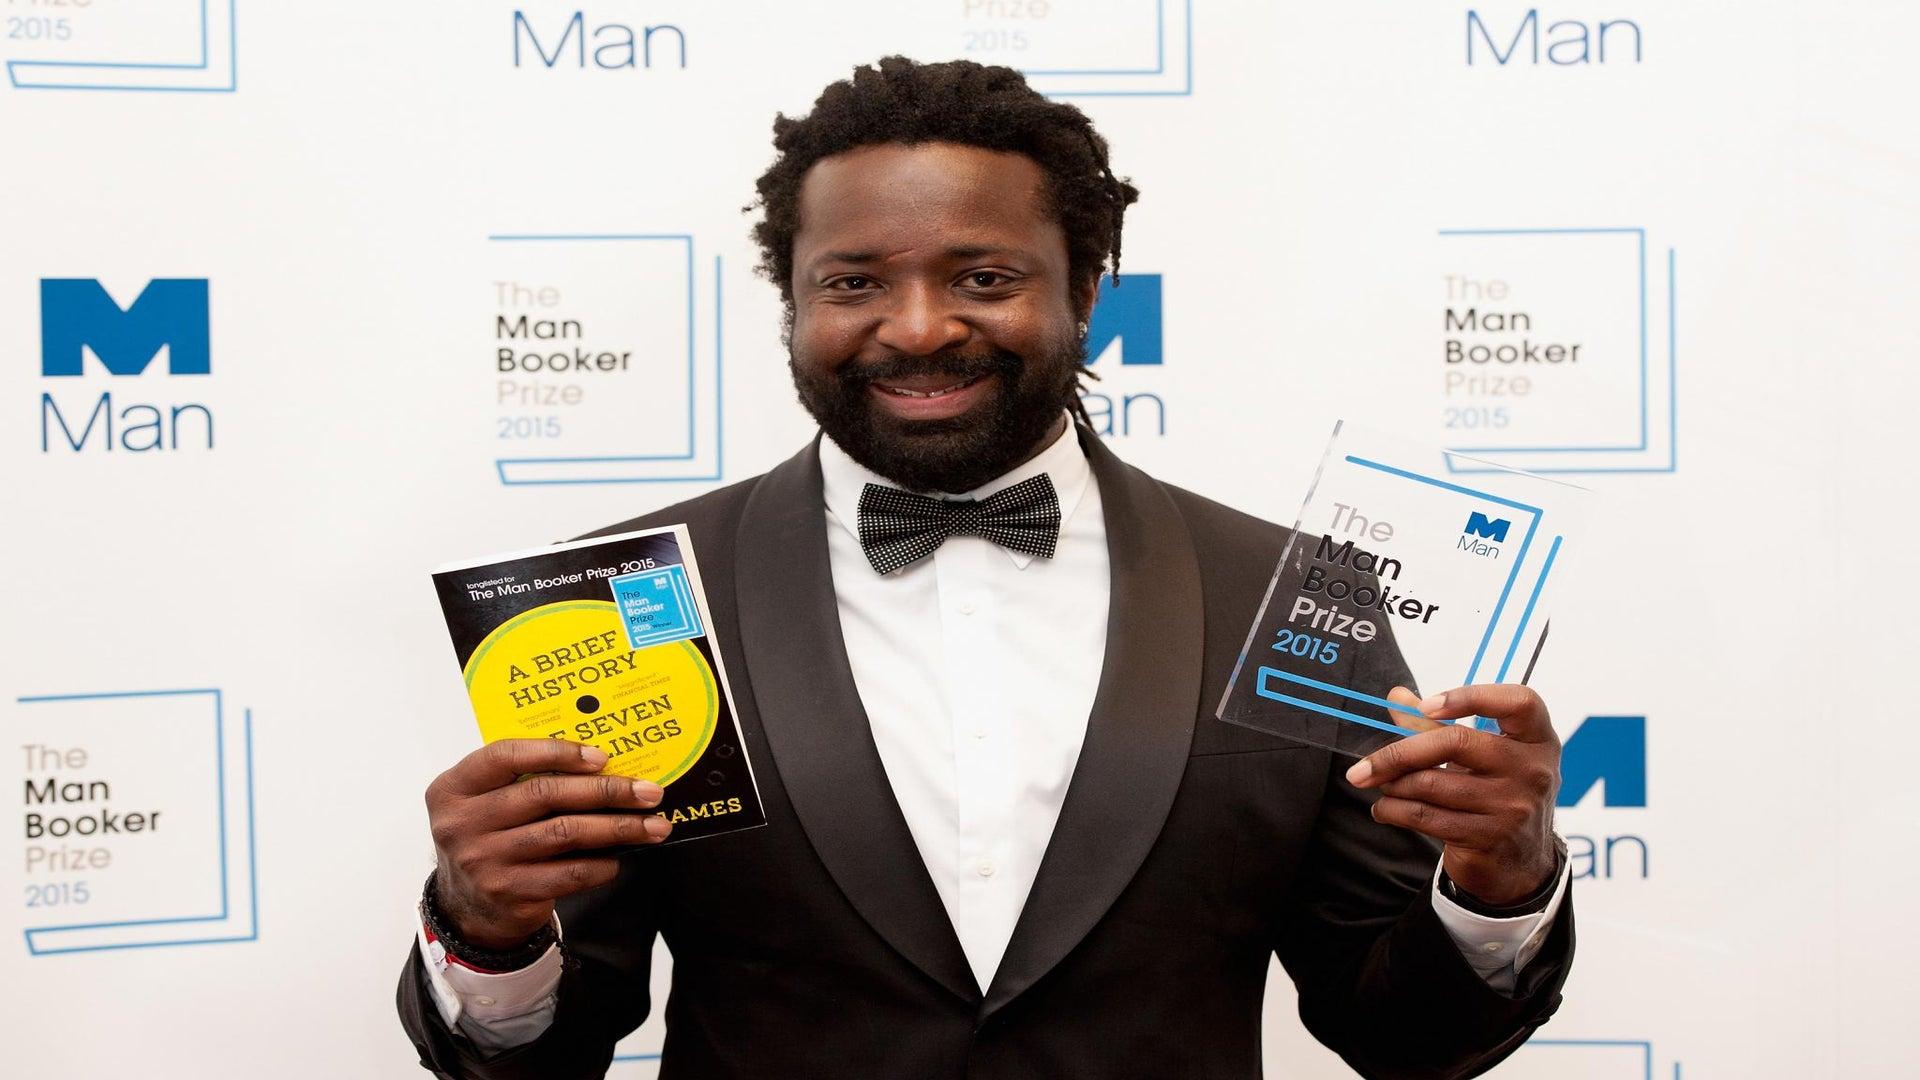 Jamaican Author Marlon James Wins Man Booker Prize